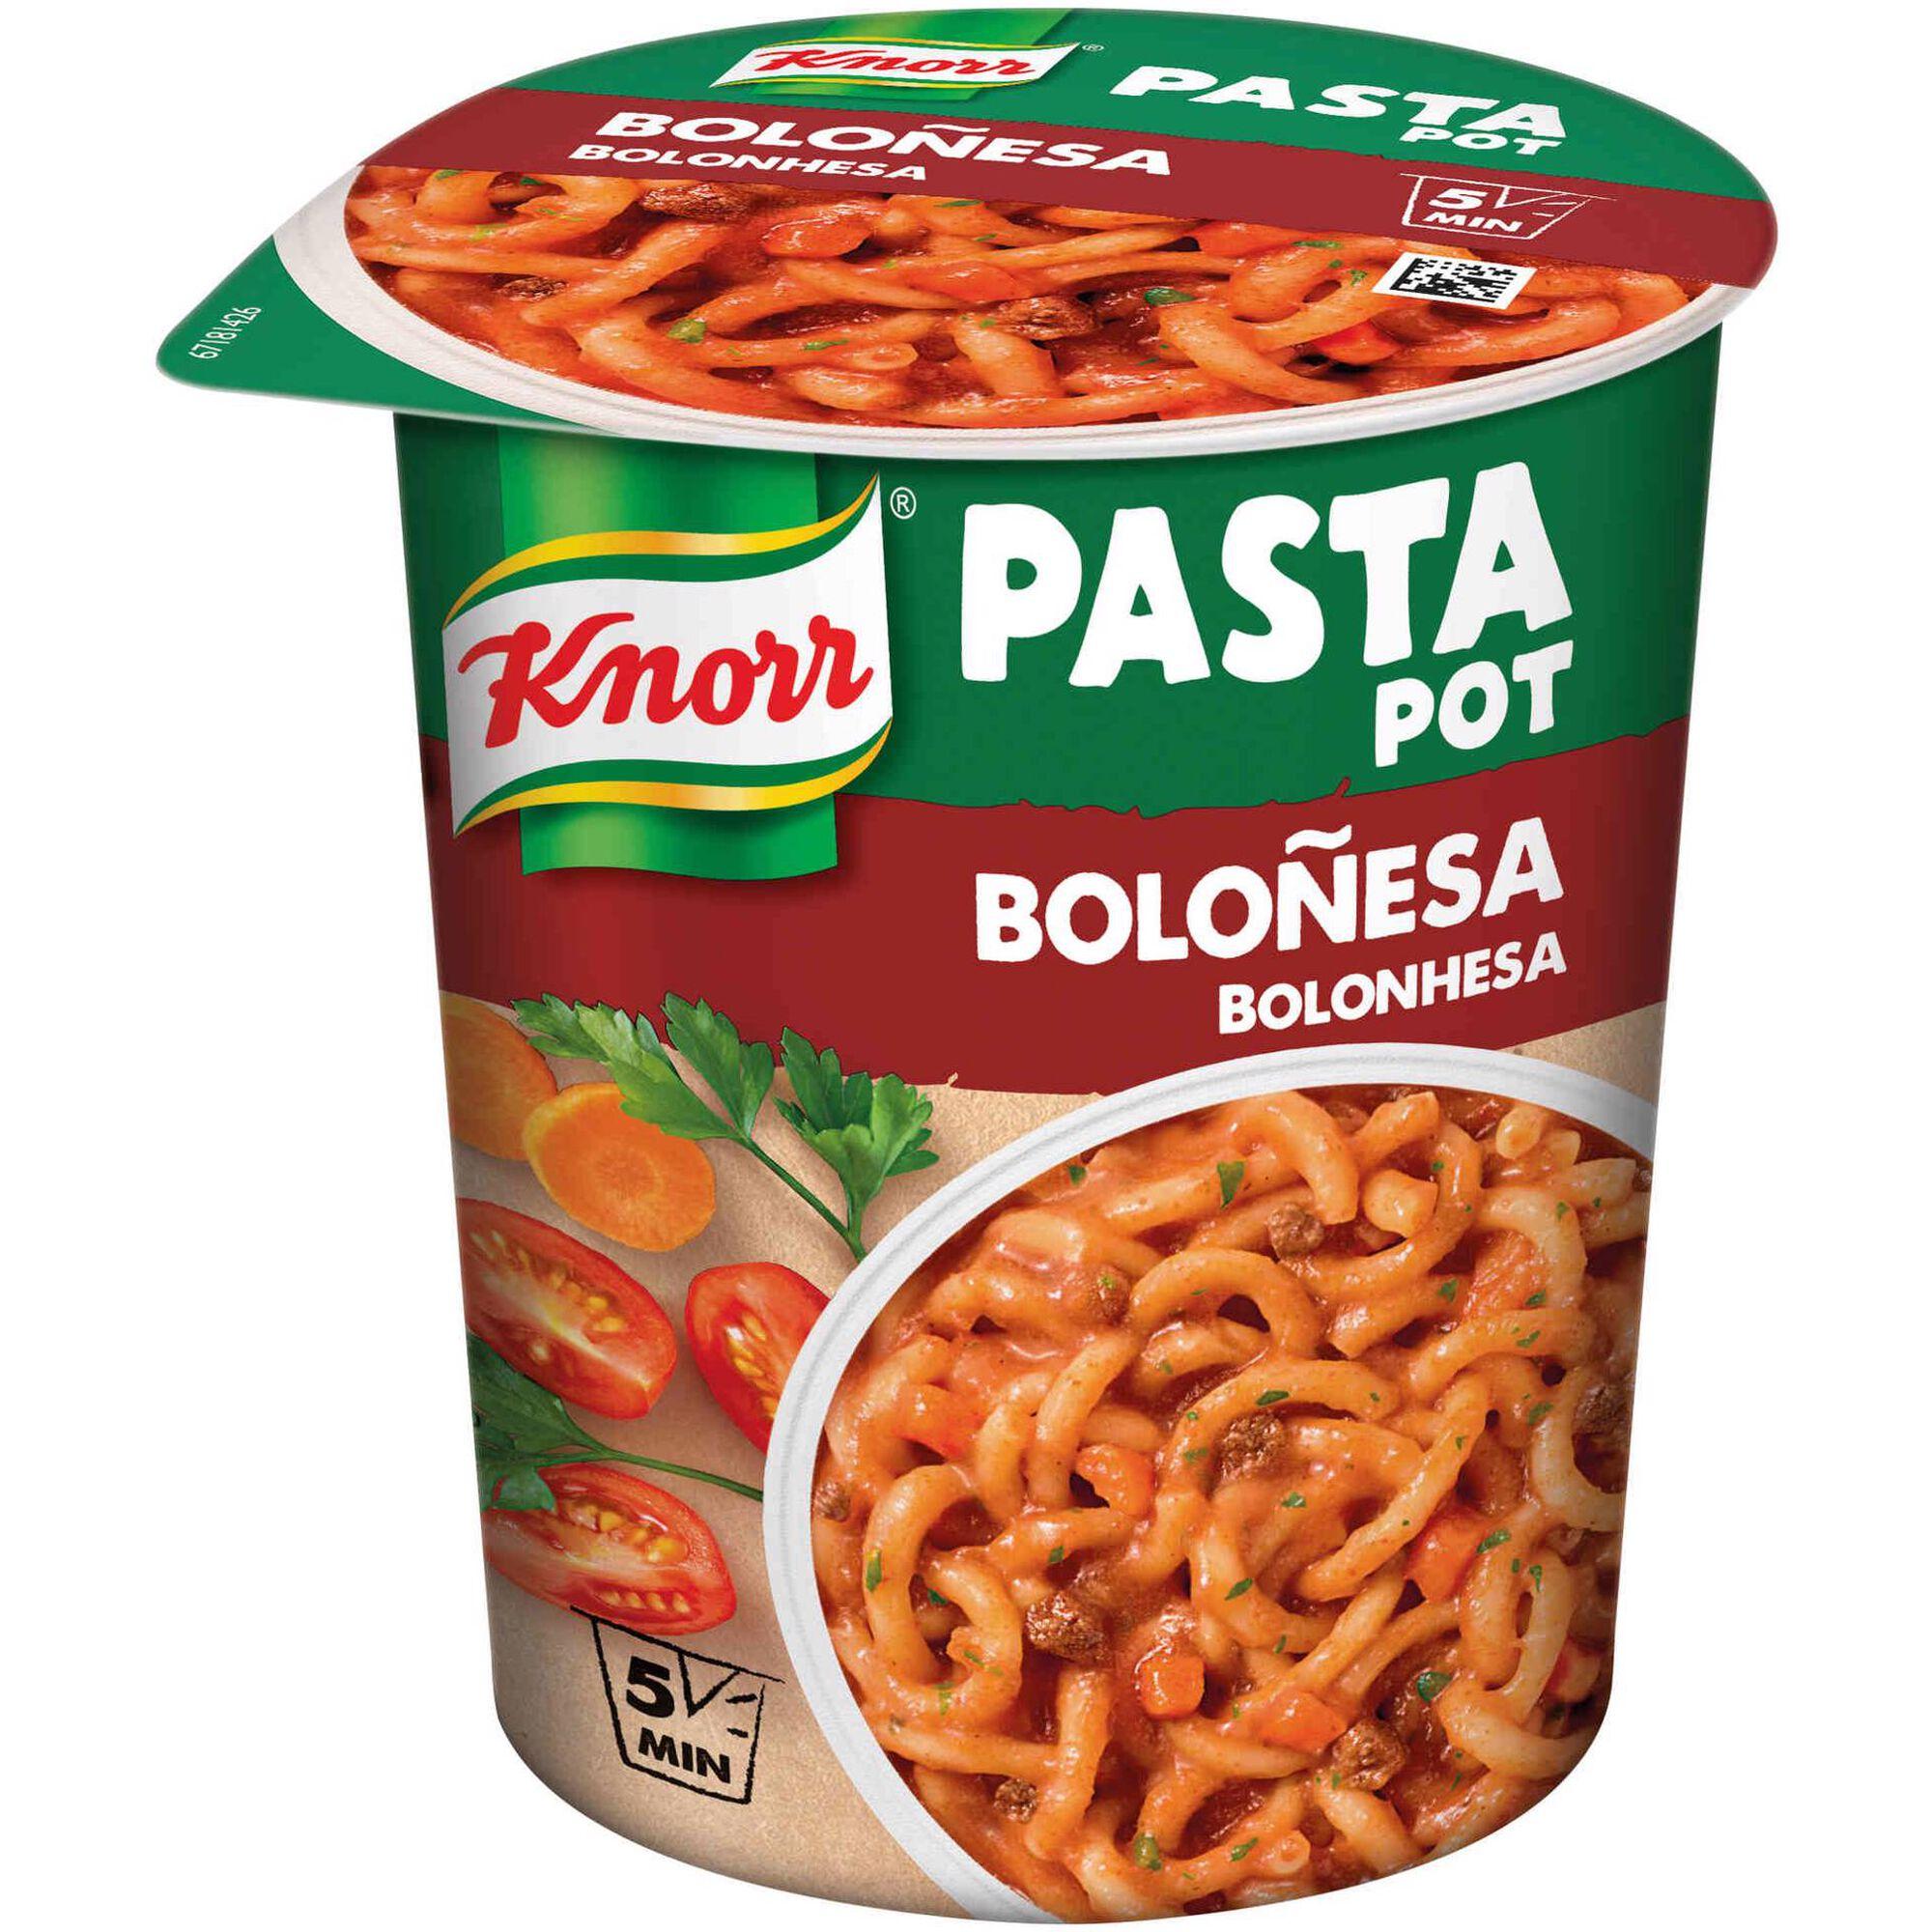 Pasta Bolonhesa Pot